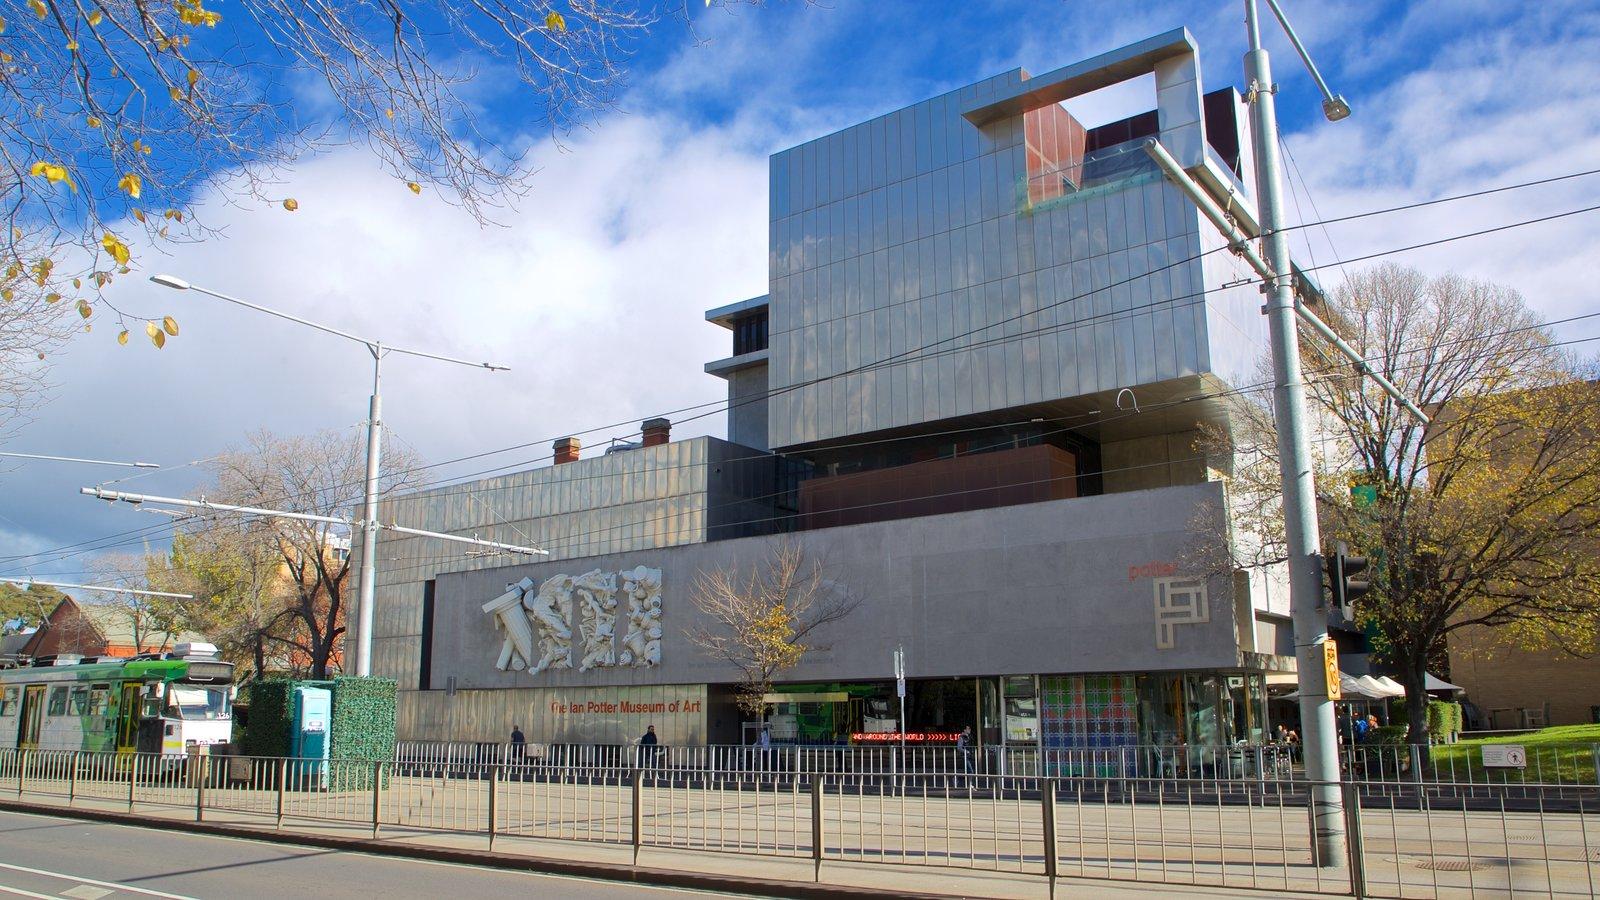 Museo de arte Ian Potter que incluye arquitectura moderna